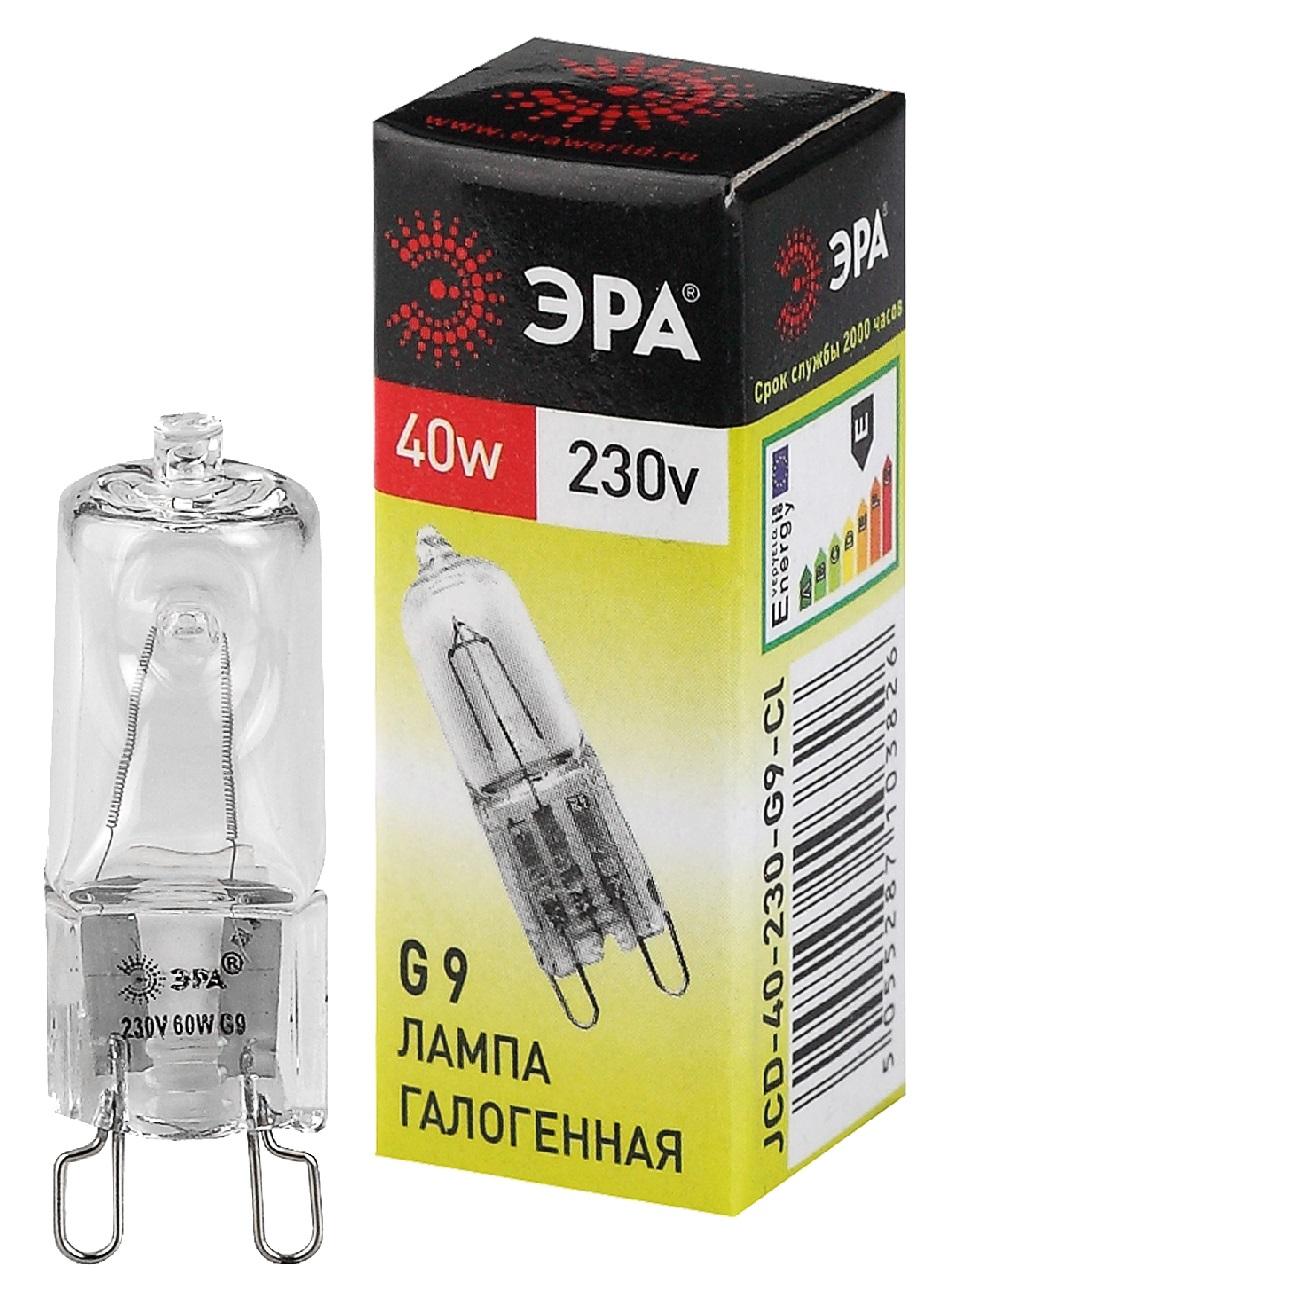 Фото - Лампа галогенная ЭРА G9-JCD-40-230V-Cl лампа галогенная эра gu5 3 jcdr mr16 35w 230v cl